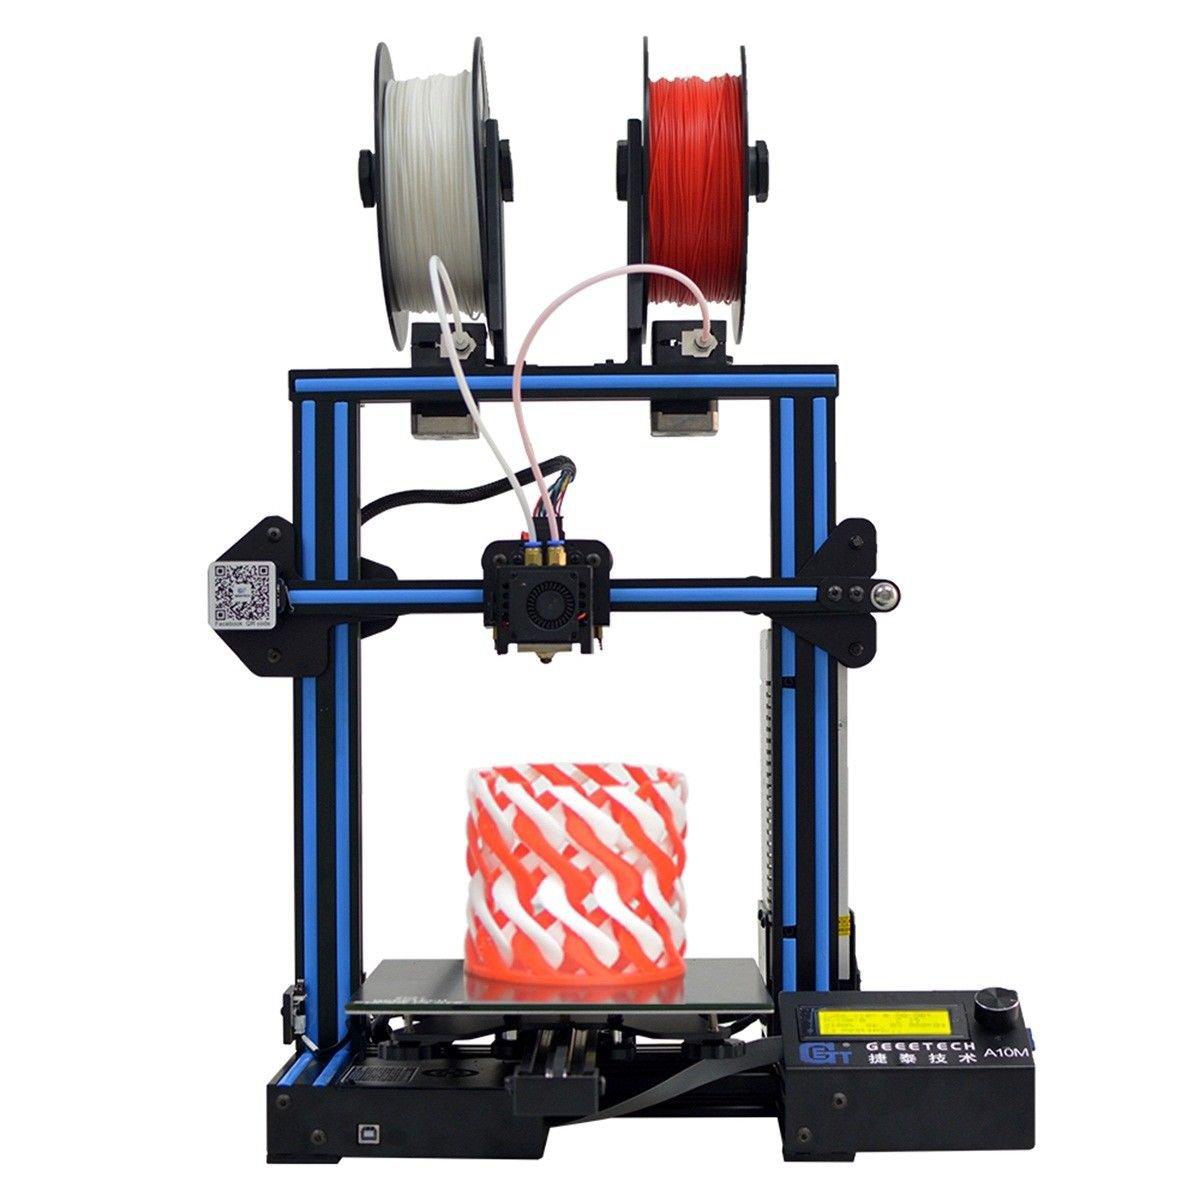 Geeetech® A10M Mix-color Prusa I3 3D Printer 220*220*260mm Printing Size Dual Extruder/Filament